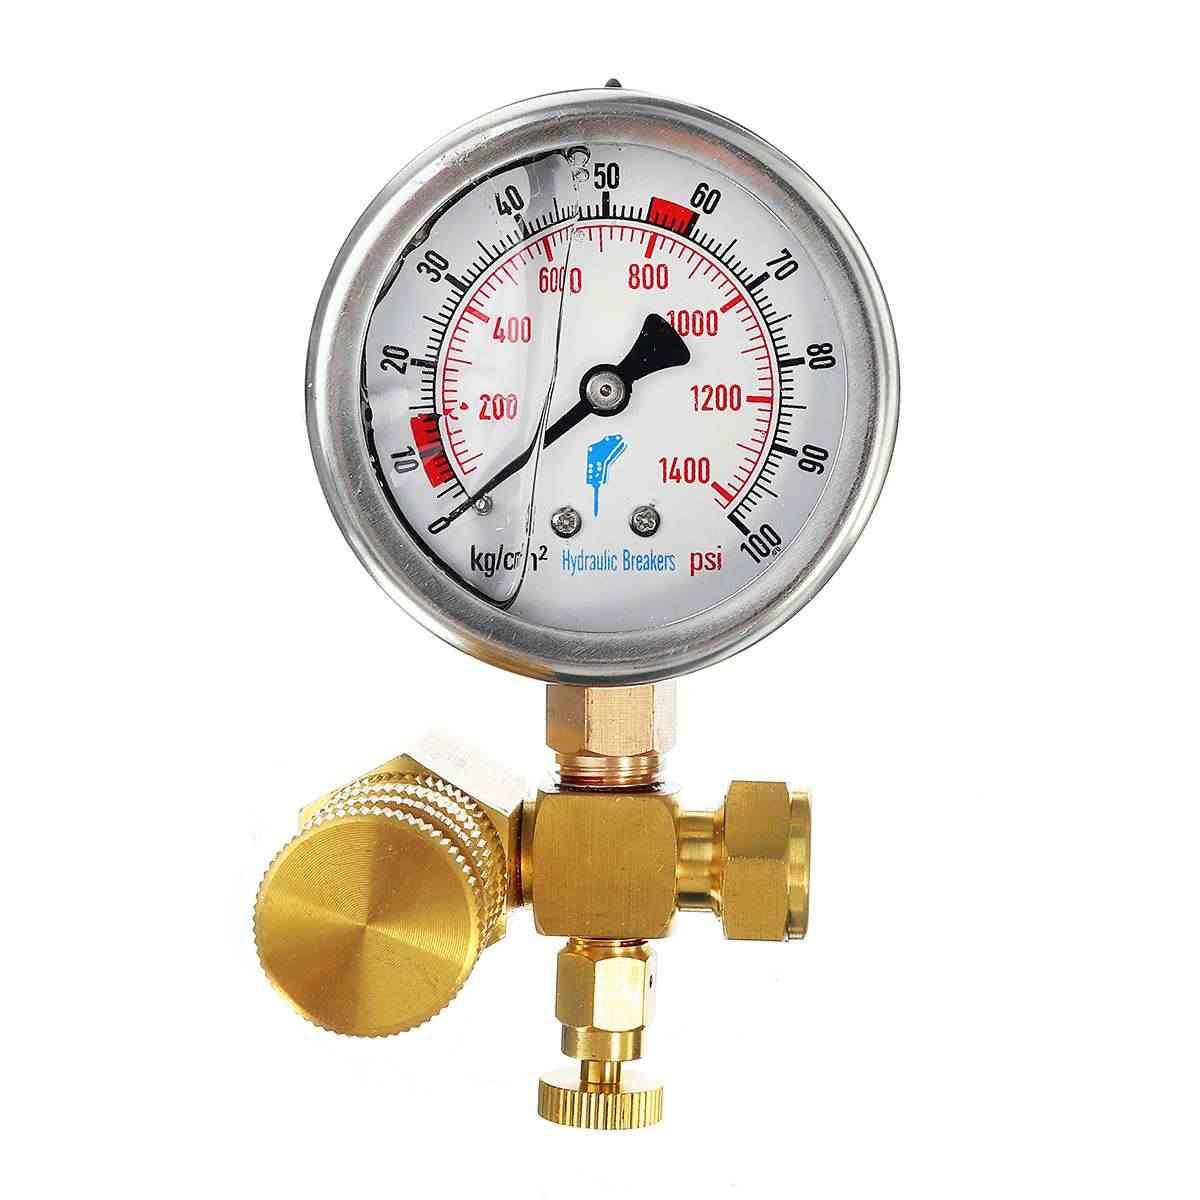 6cm Dia. Pressure Gauges Kit Nitrogen Gas Charging Hydraulic Breaker Hammer Device Measure Accessories For Furukawa Soosan-JY04